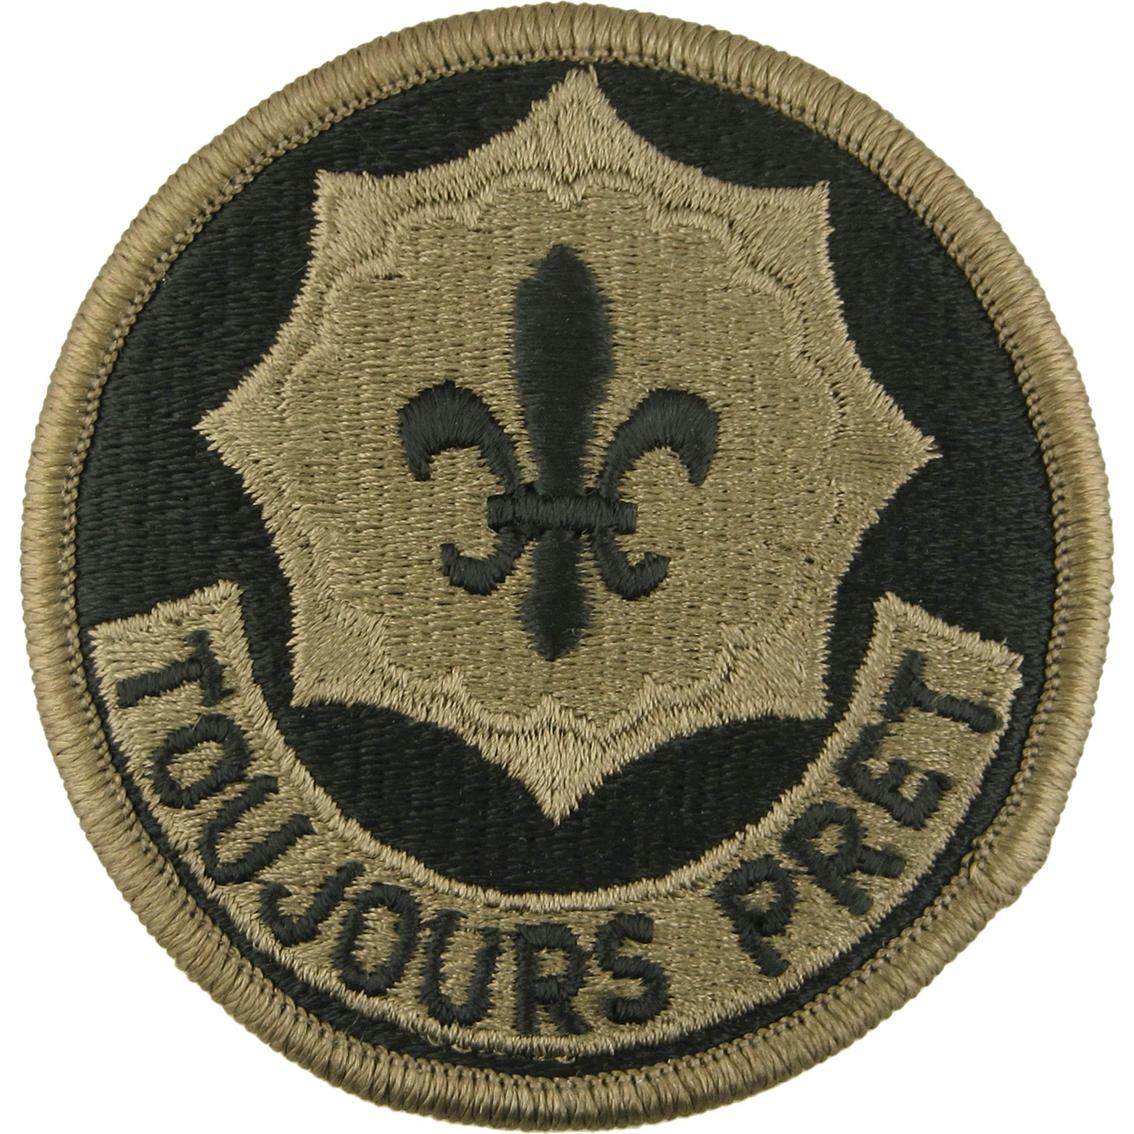 Army Unit Patch 2nd Cavalry Regiment (ocp)   Ocp Unit